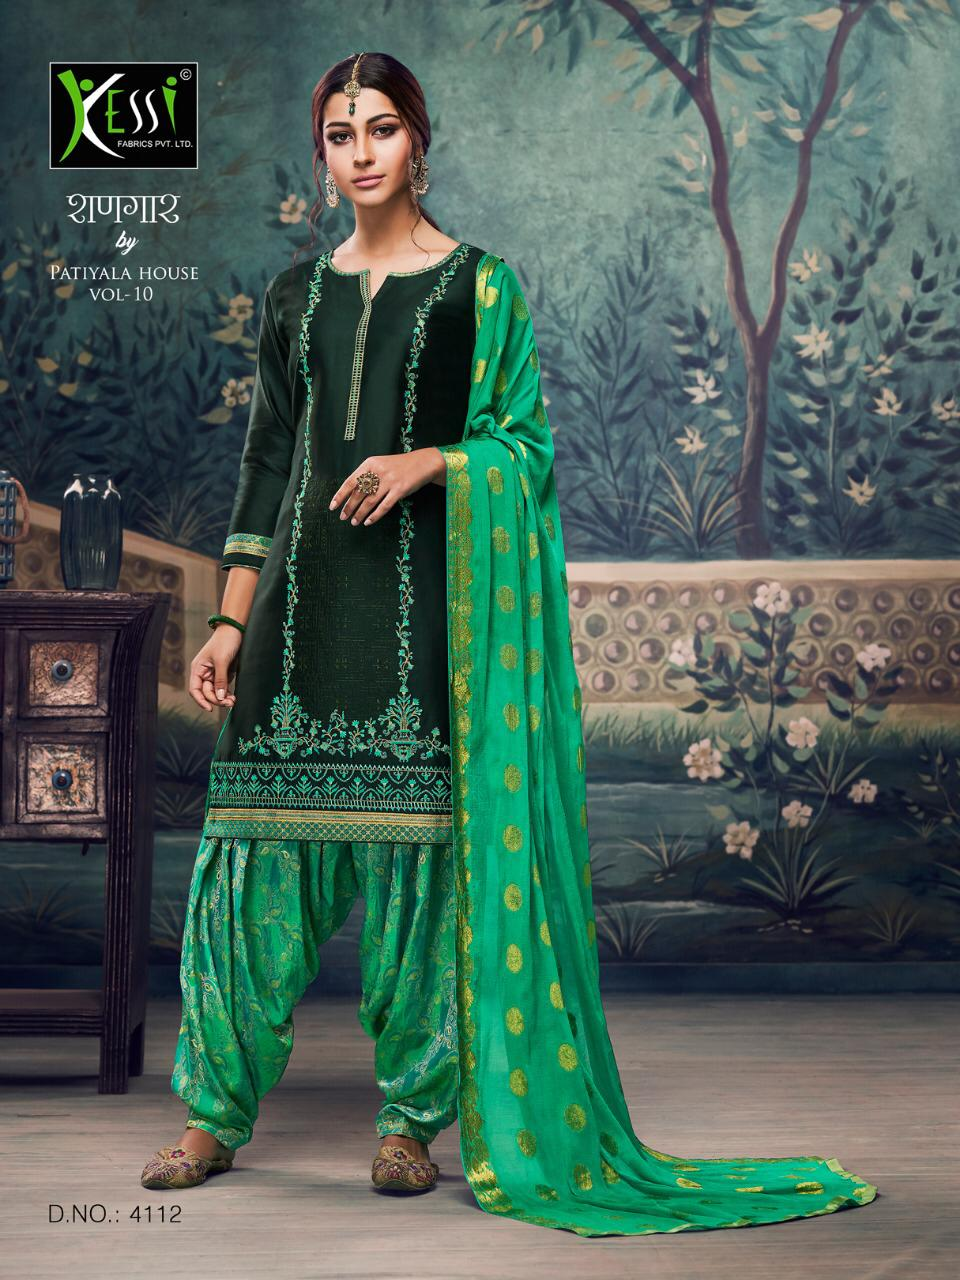 Kessi Fabrics Shangar By Patiyala Vol10 Suits Wholesale